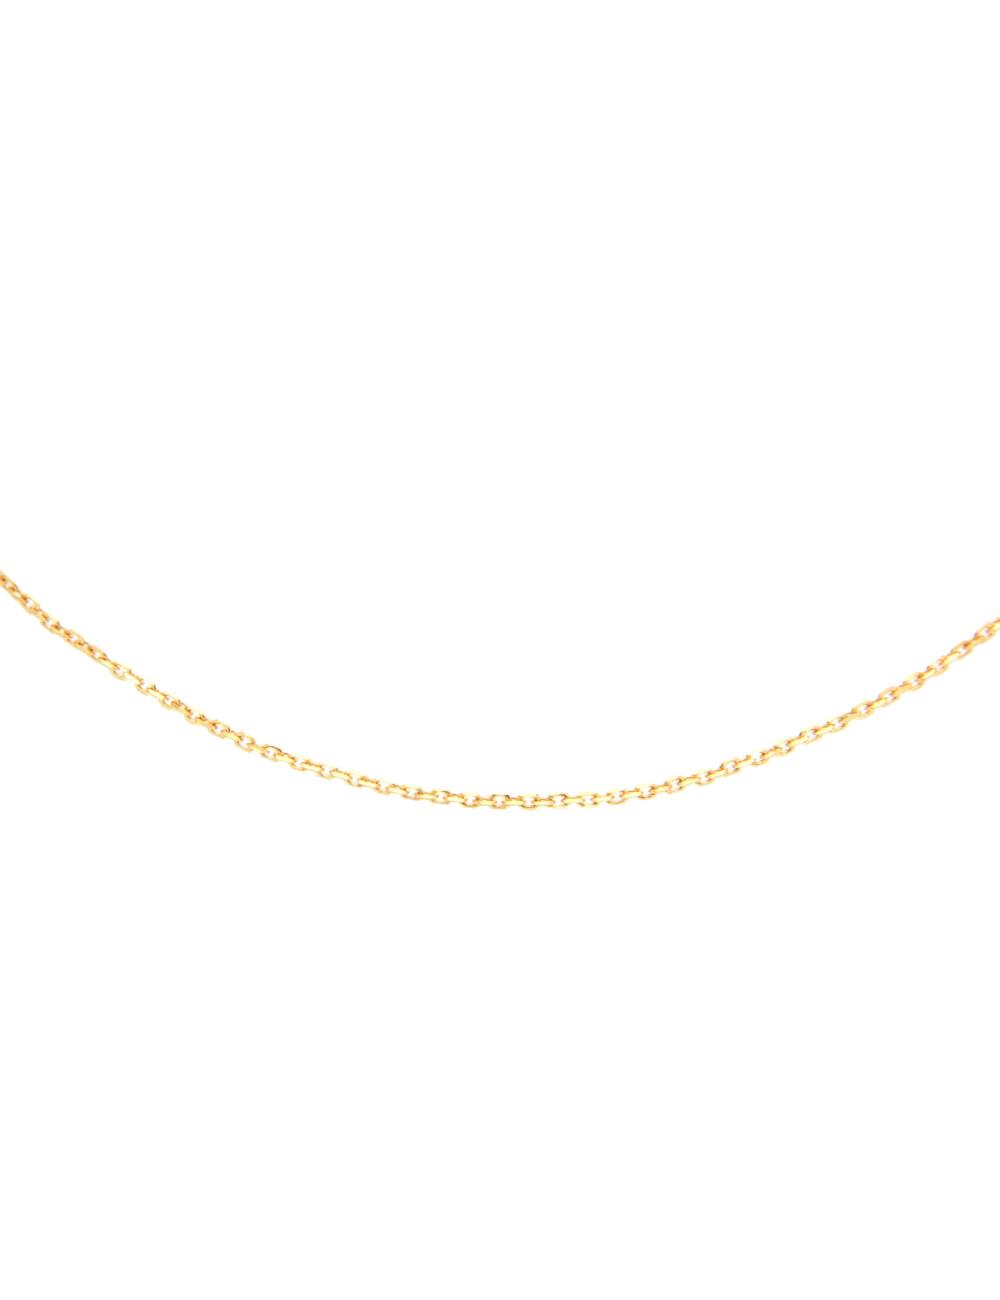 Pendentif Dauphin Or Jaune 18 Carats + chaine